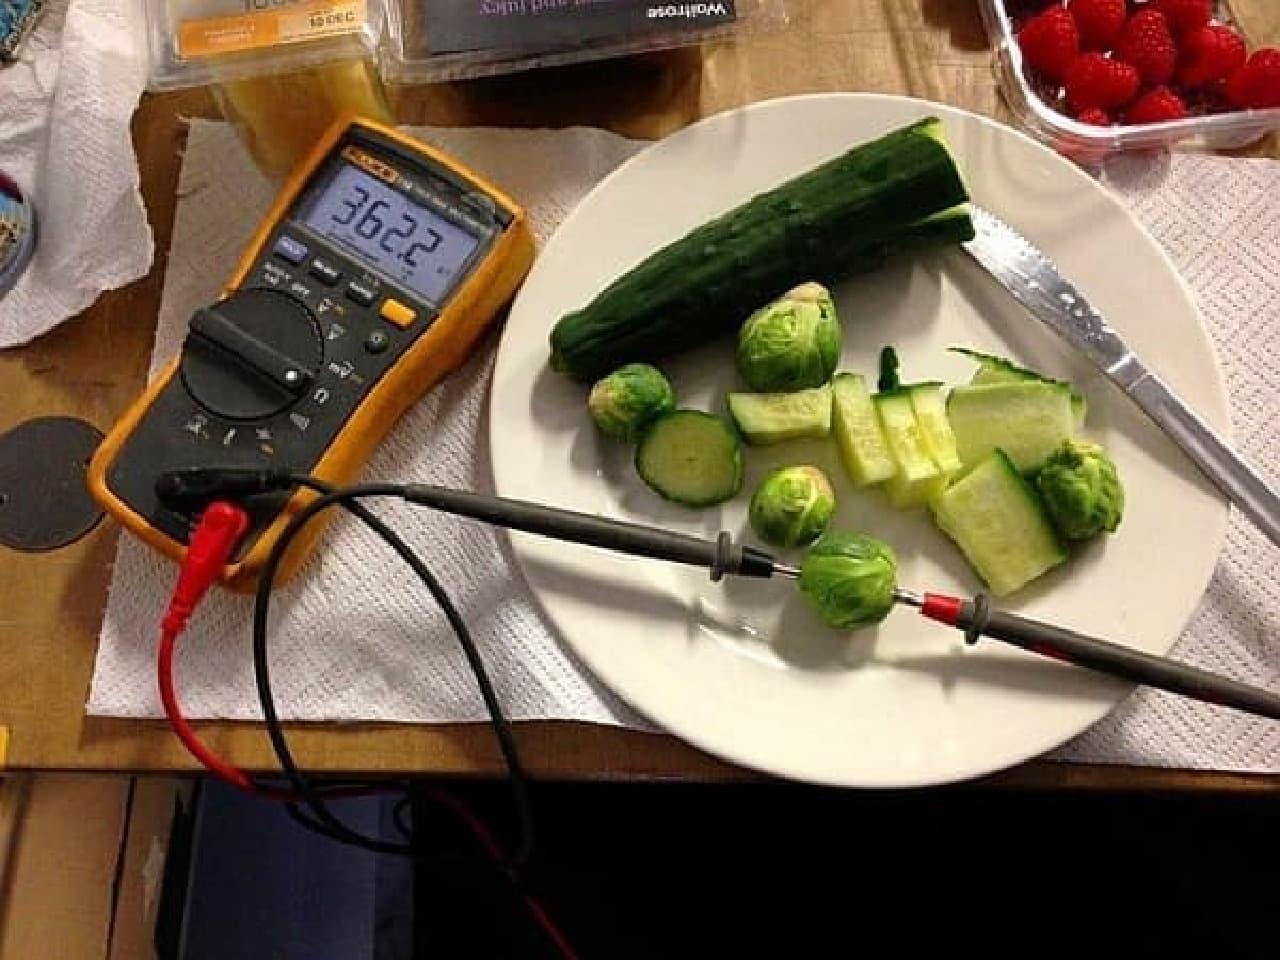 Kumar 氏は、様々な食べ物の電気抵抗値を測定した